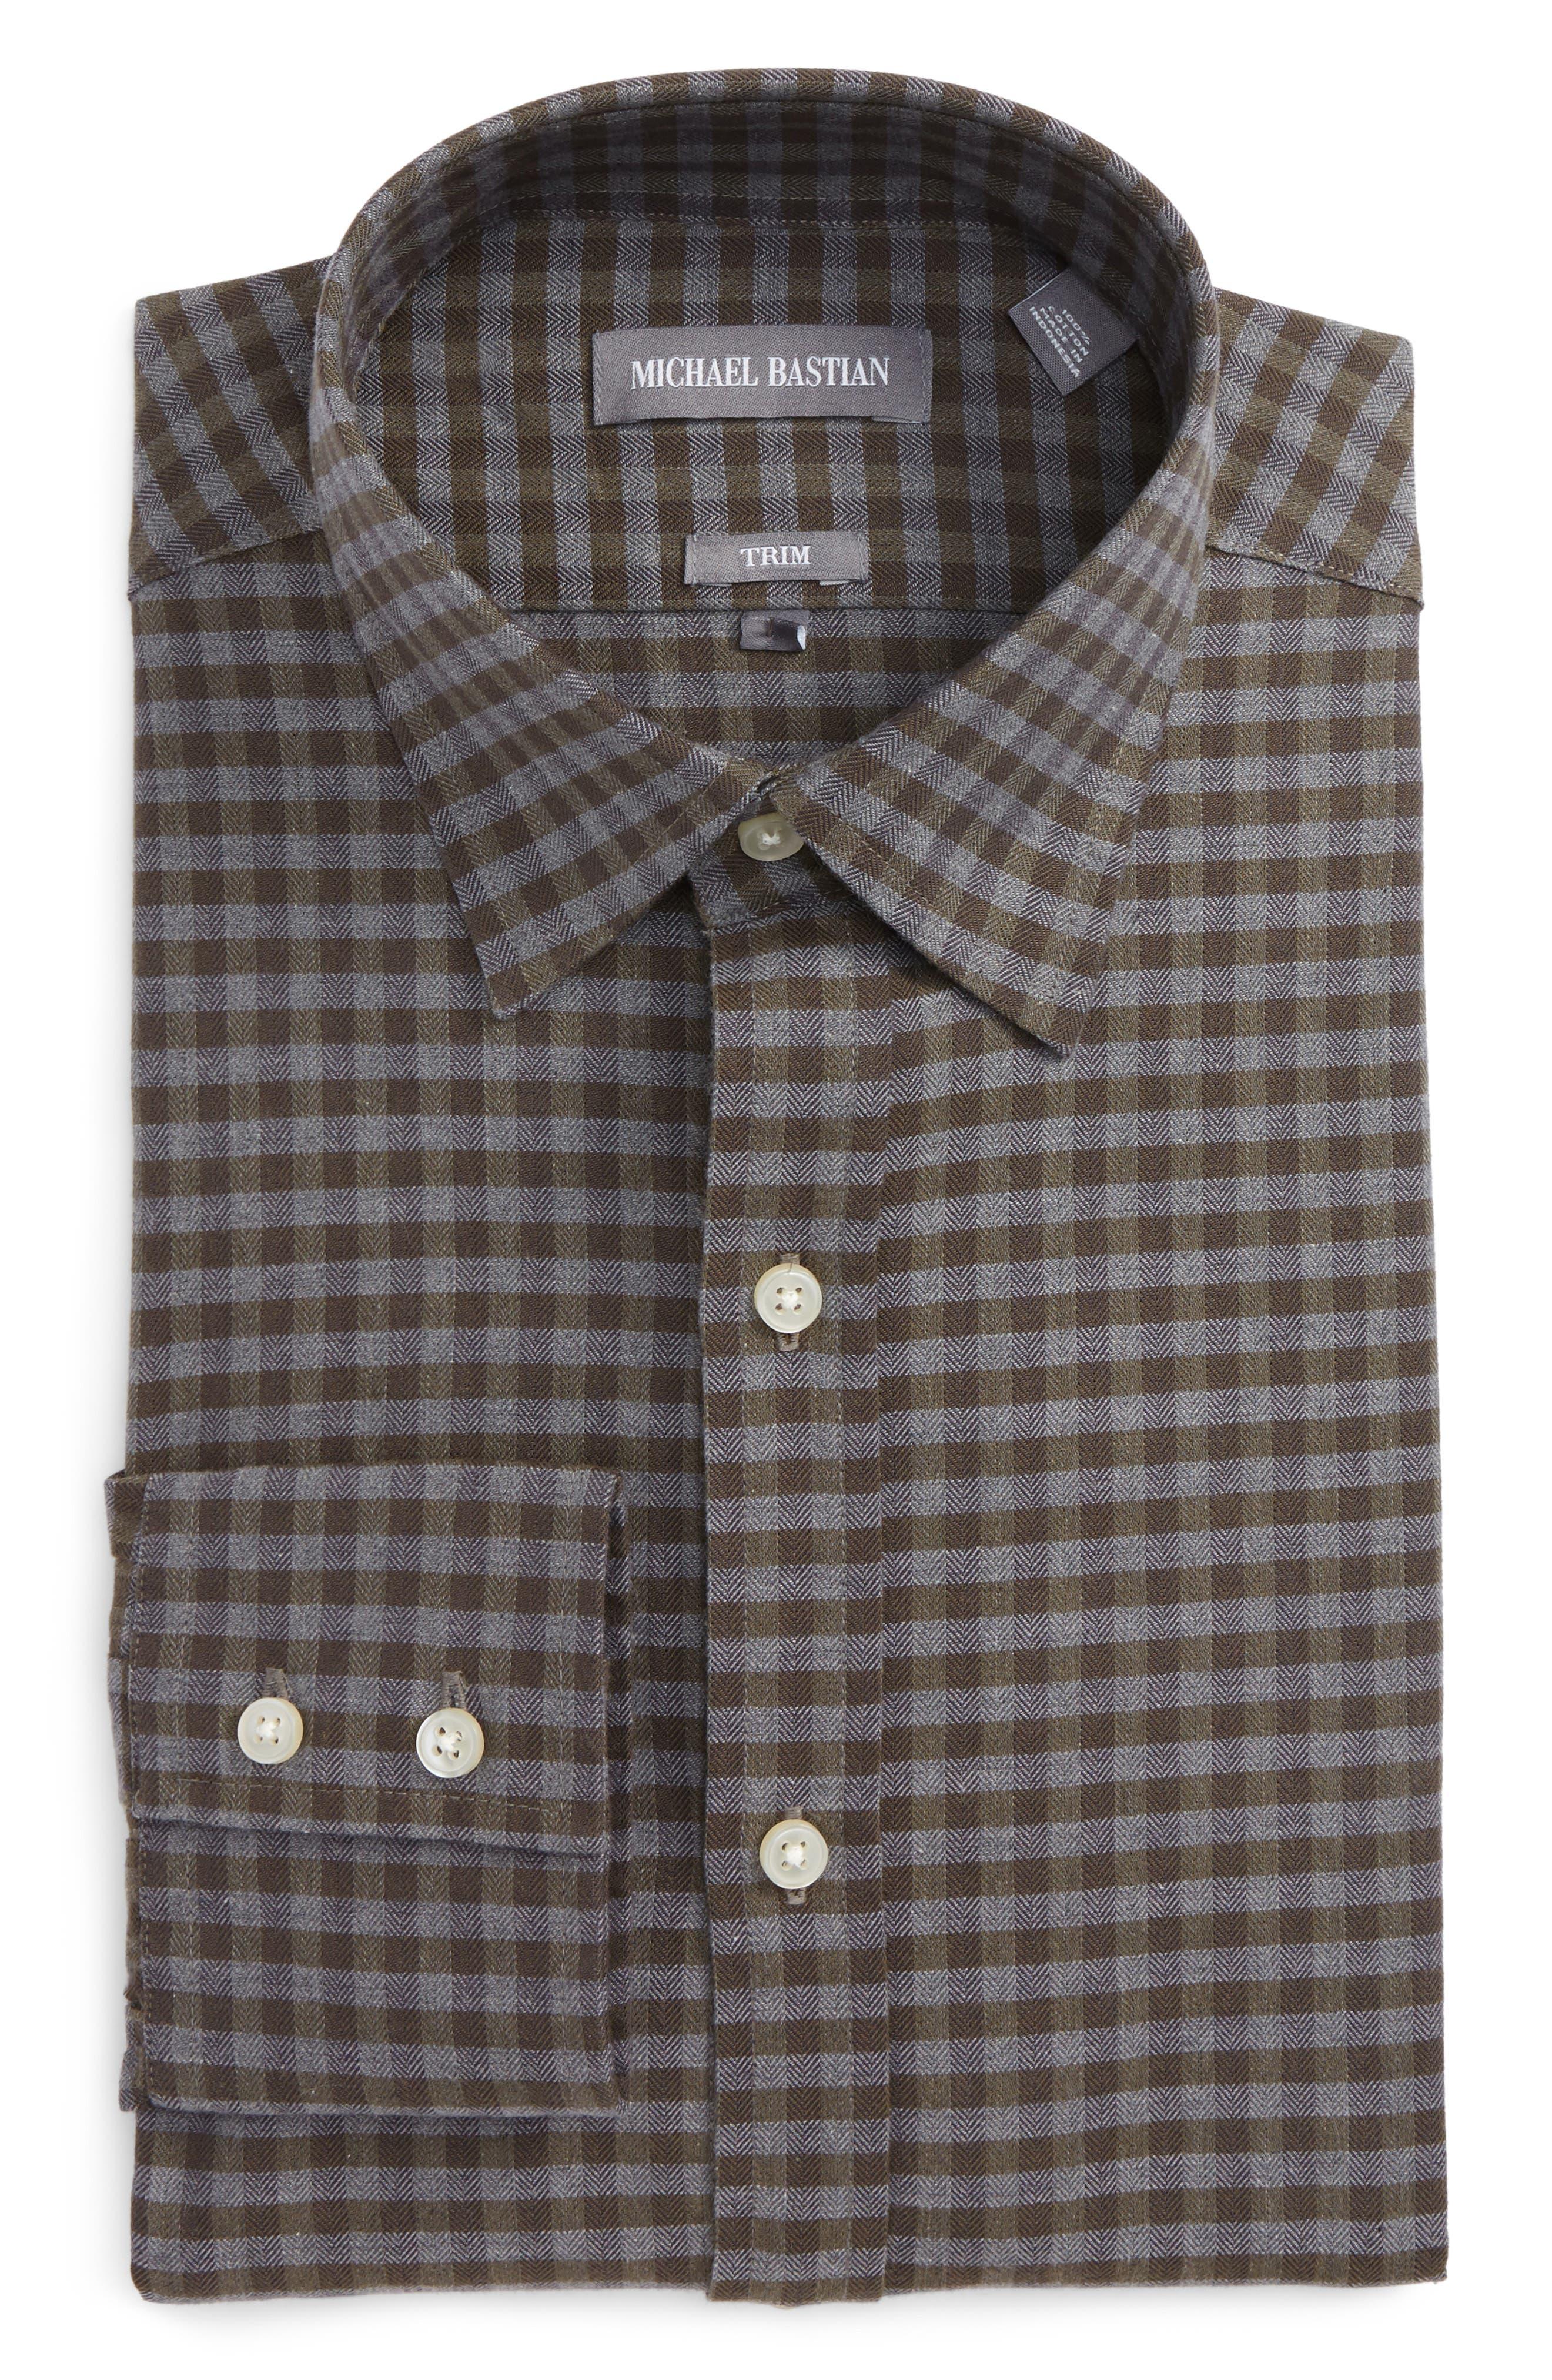 Alternate Image 1 Selected - Michael Bastian Trim Fit Check Dress Shirt